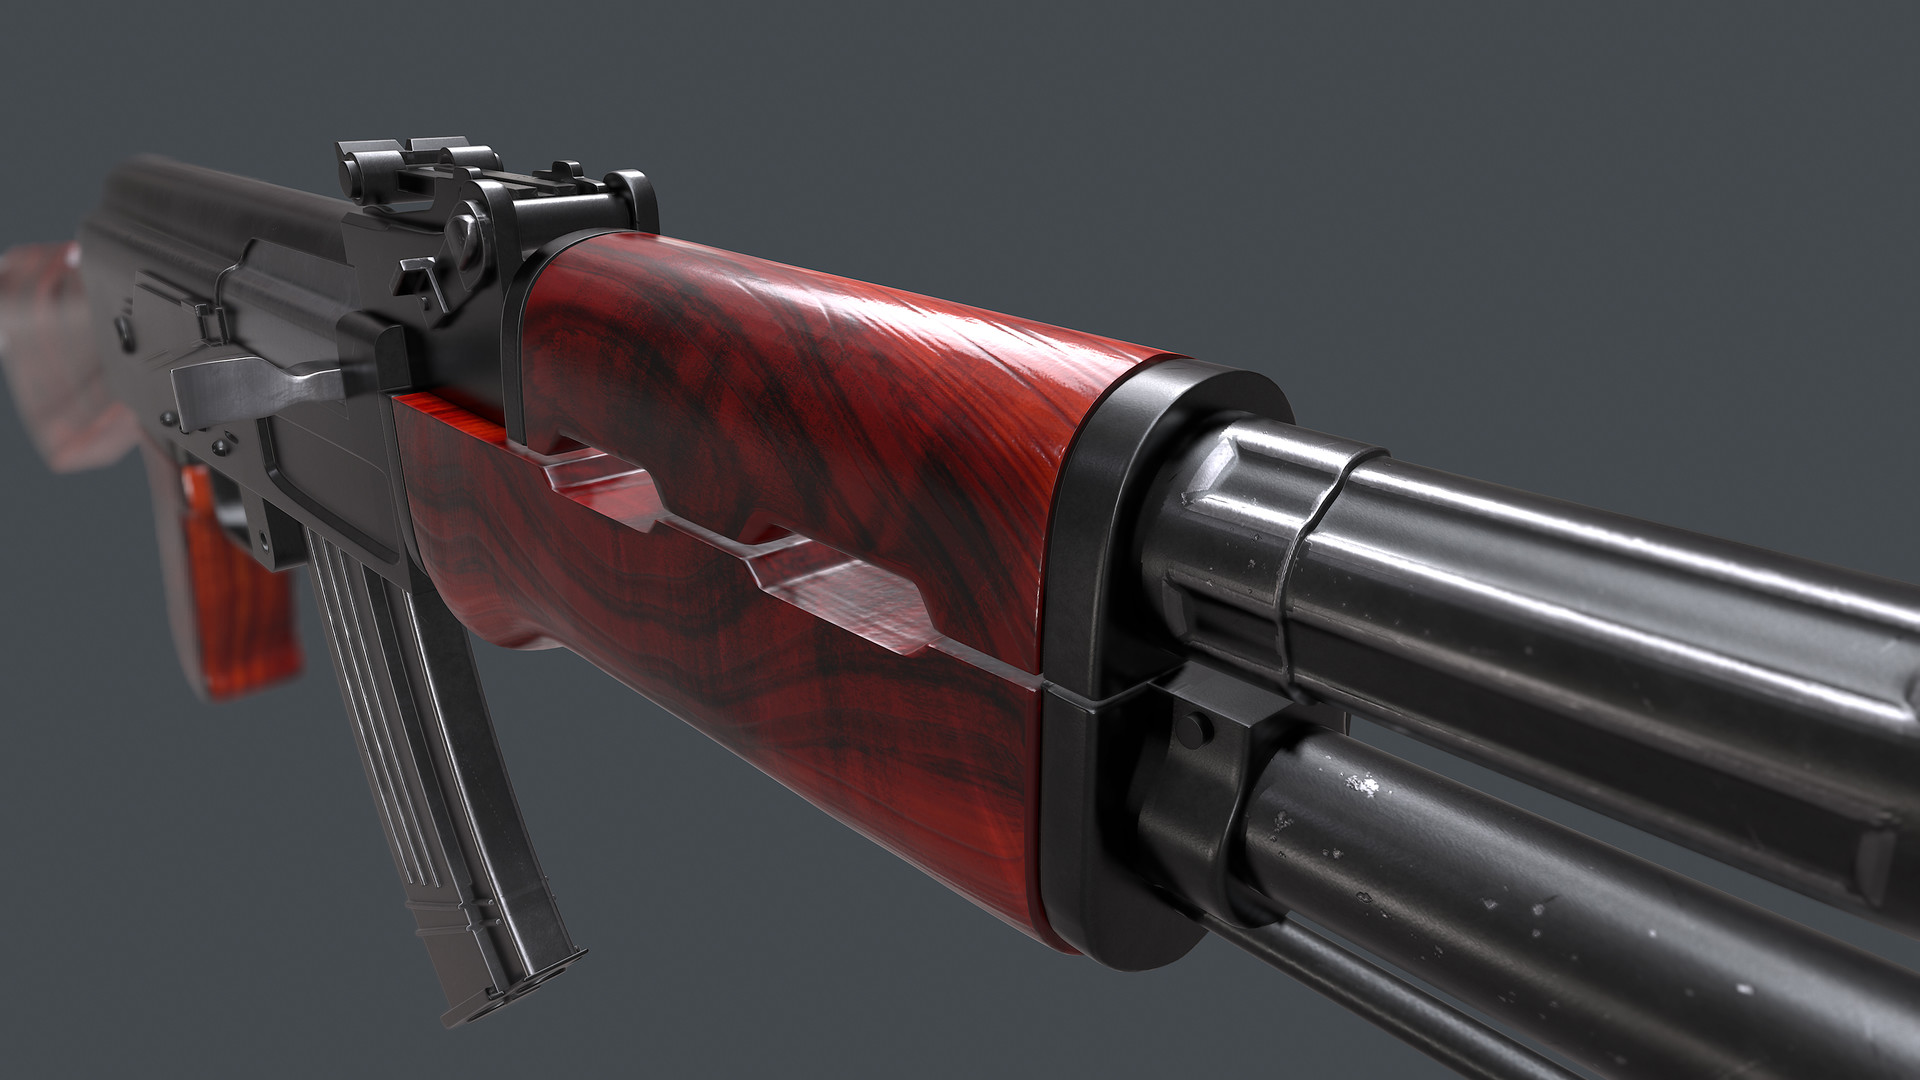 AK 47 Kalashnikov HD Wallpaper Download 1080x1920 Source ArtStation Ak 3D Model Saiful Islam